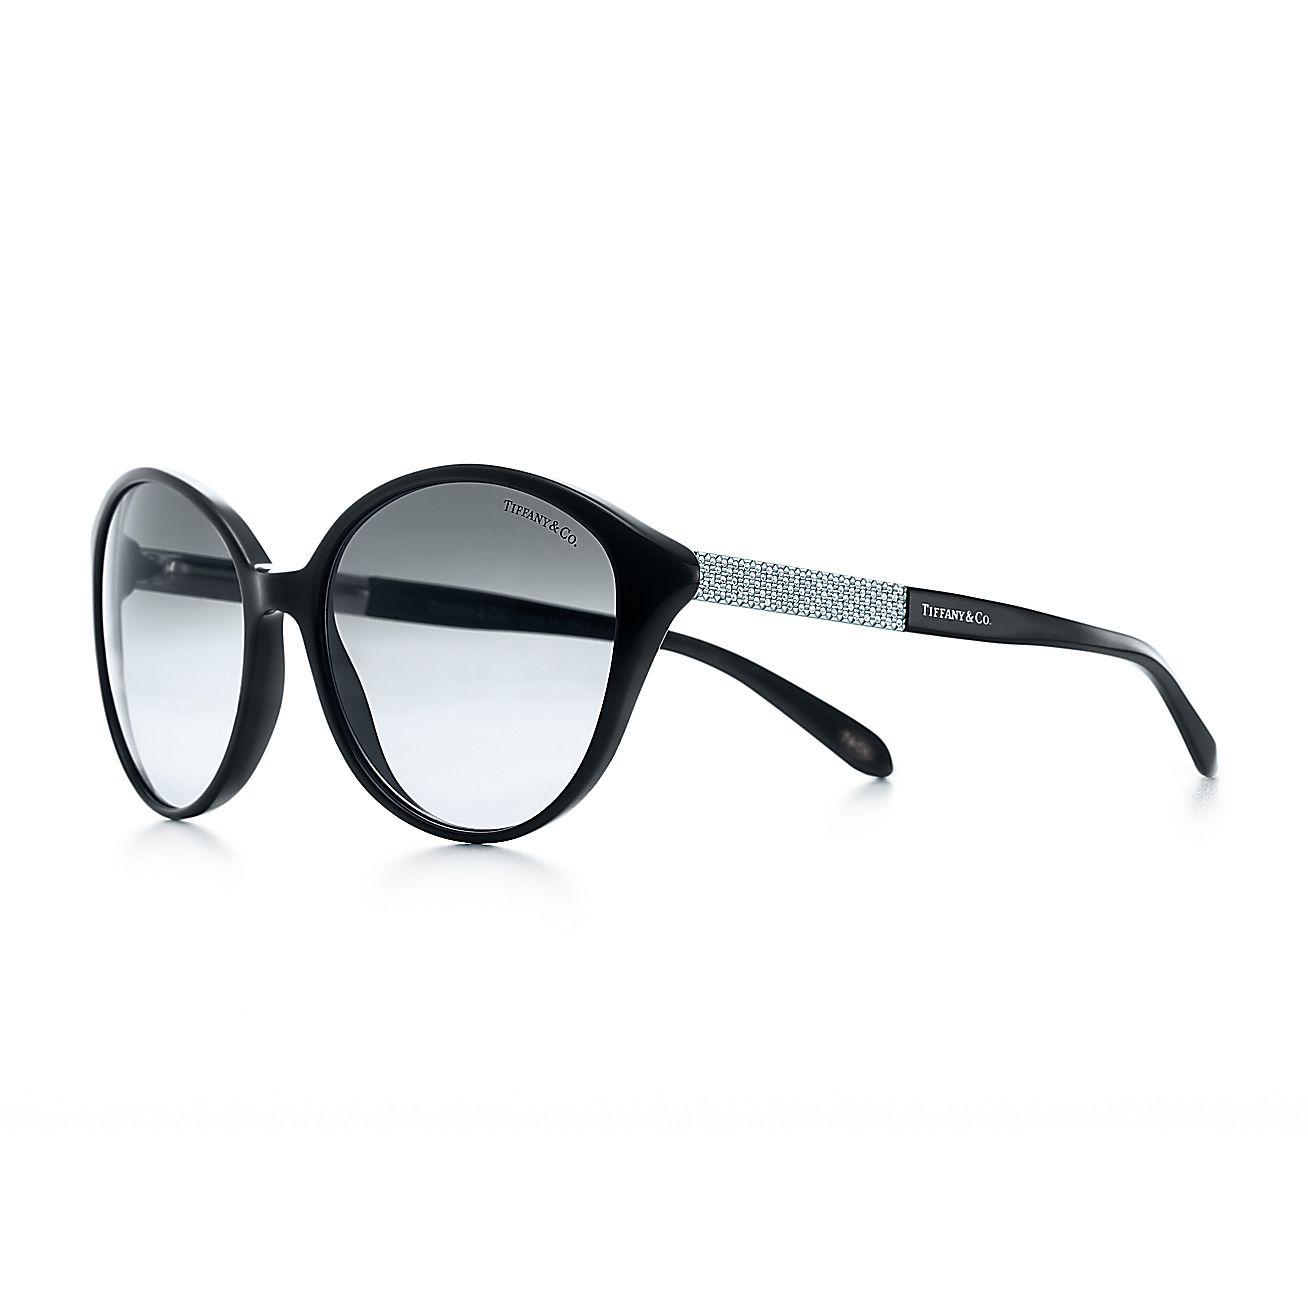 Tiffany Metro:Cat Eye Sunglasses